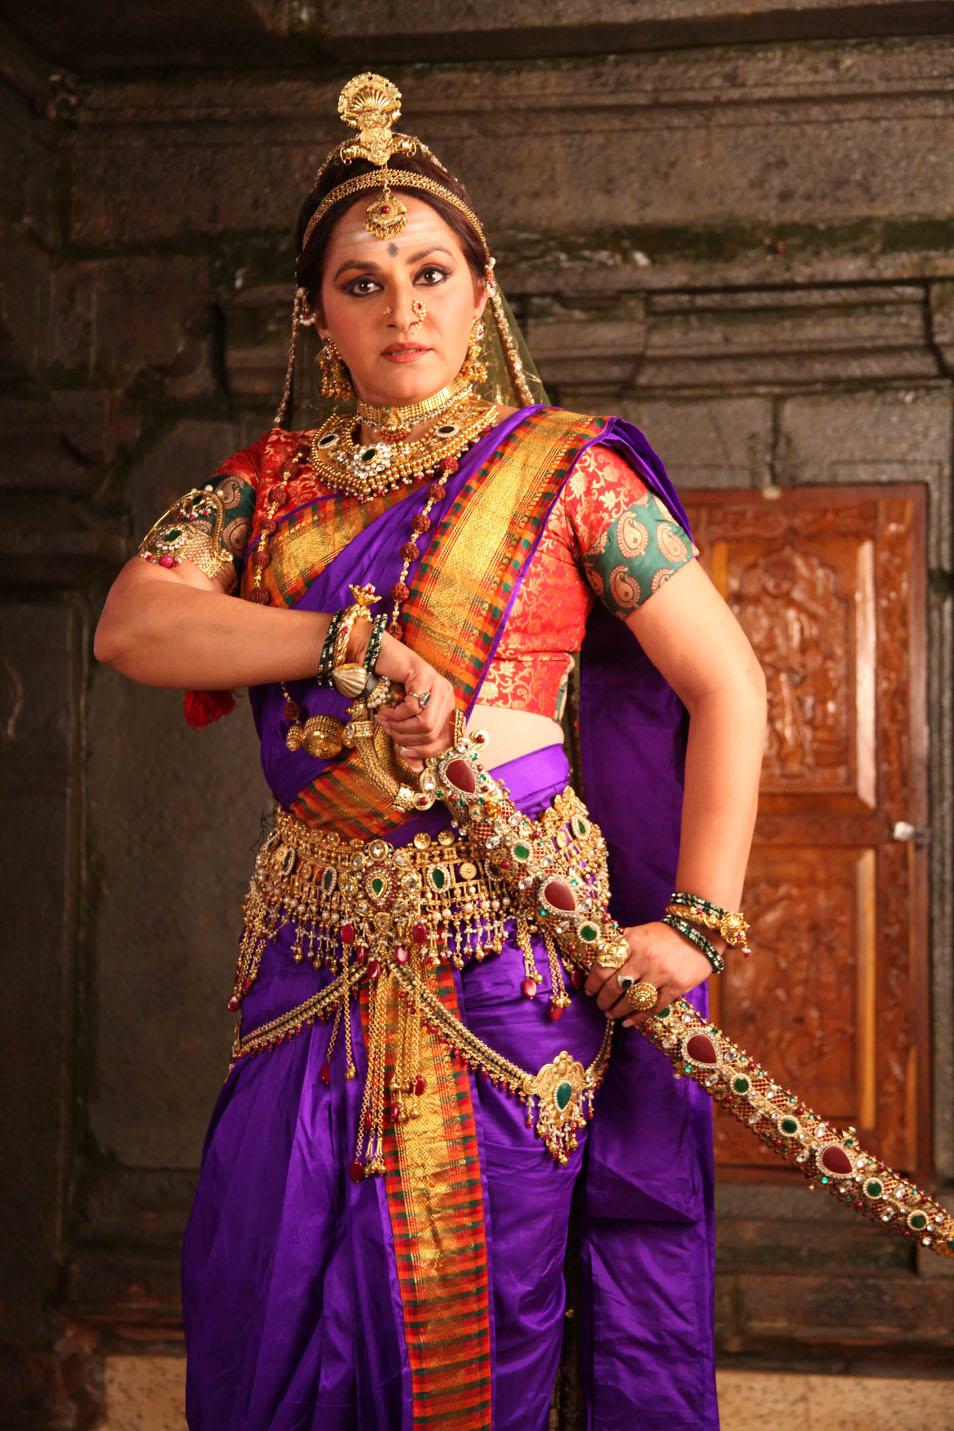 Darshan Sangoli Rayanna Photos Kannada Movie 2011 Stills -1401